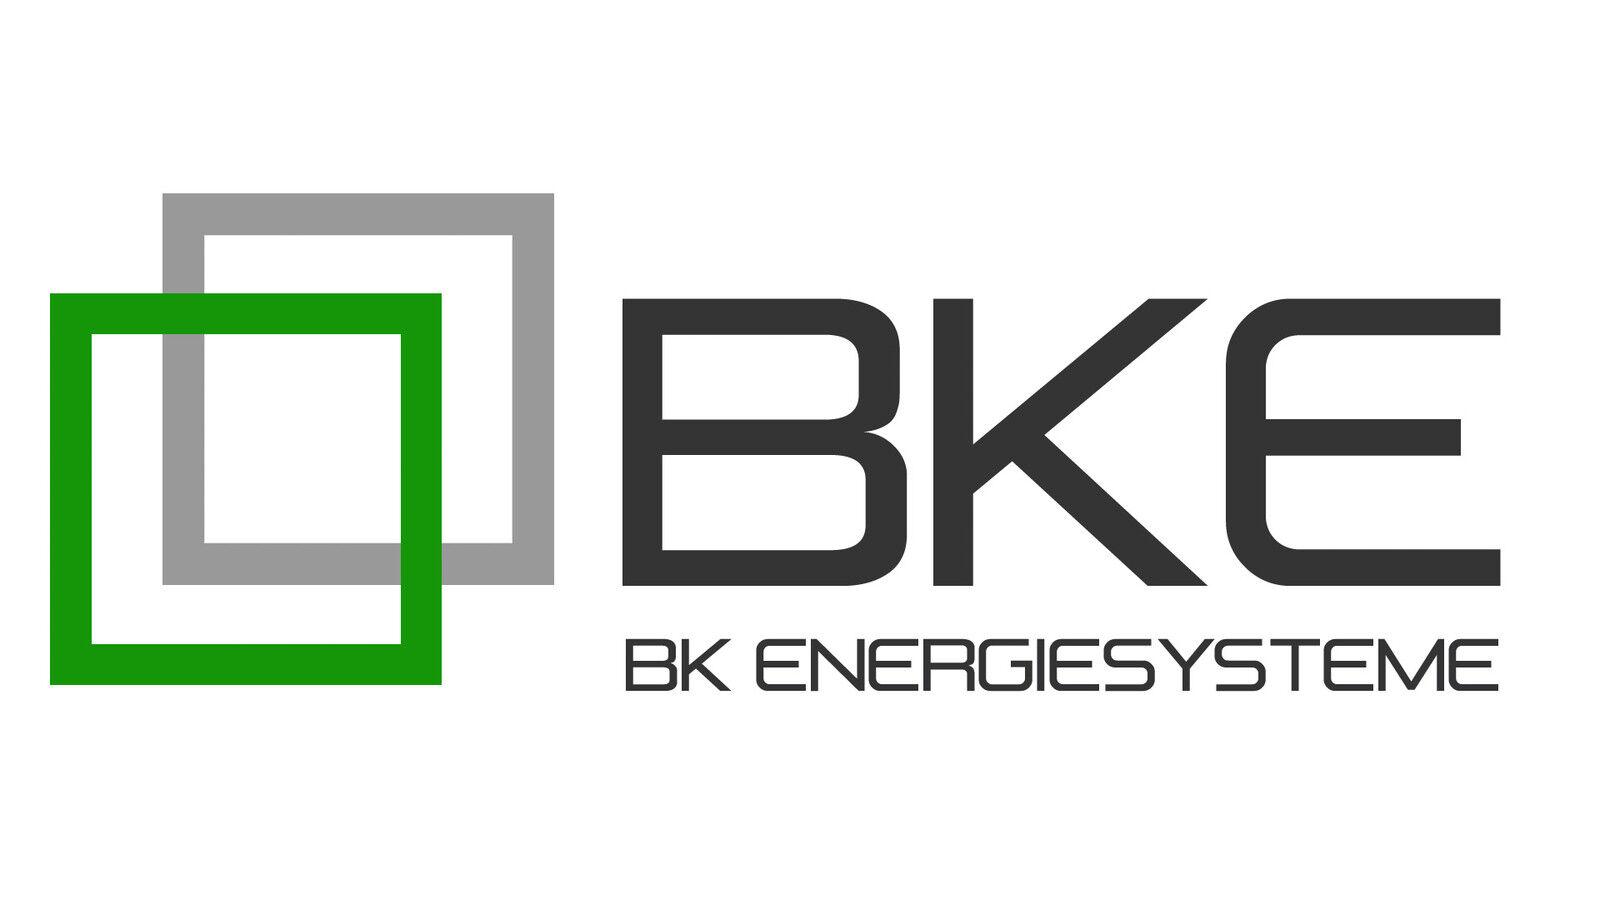 bk-energiesysteme